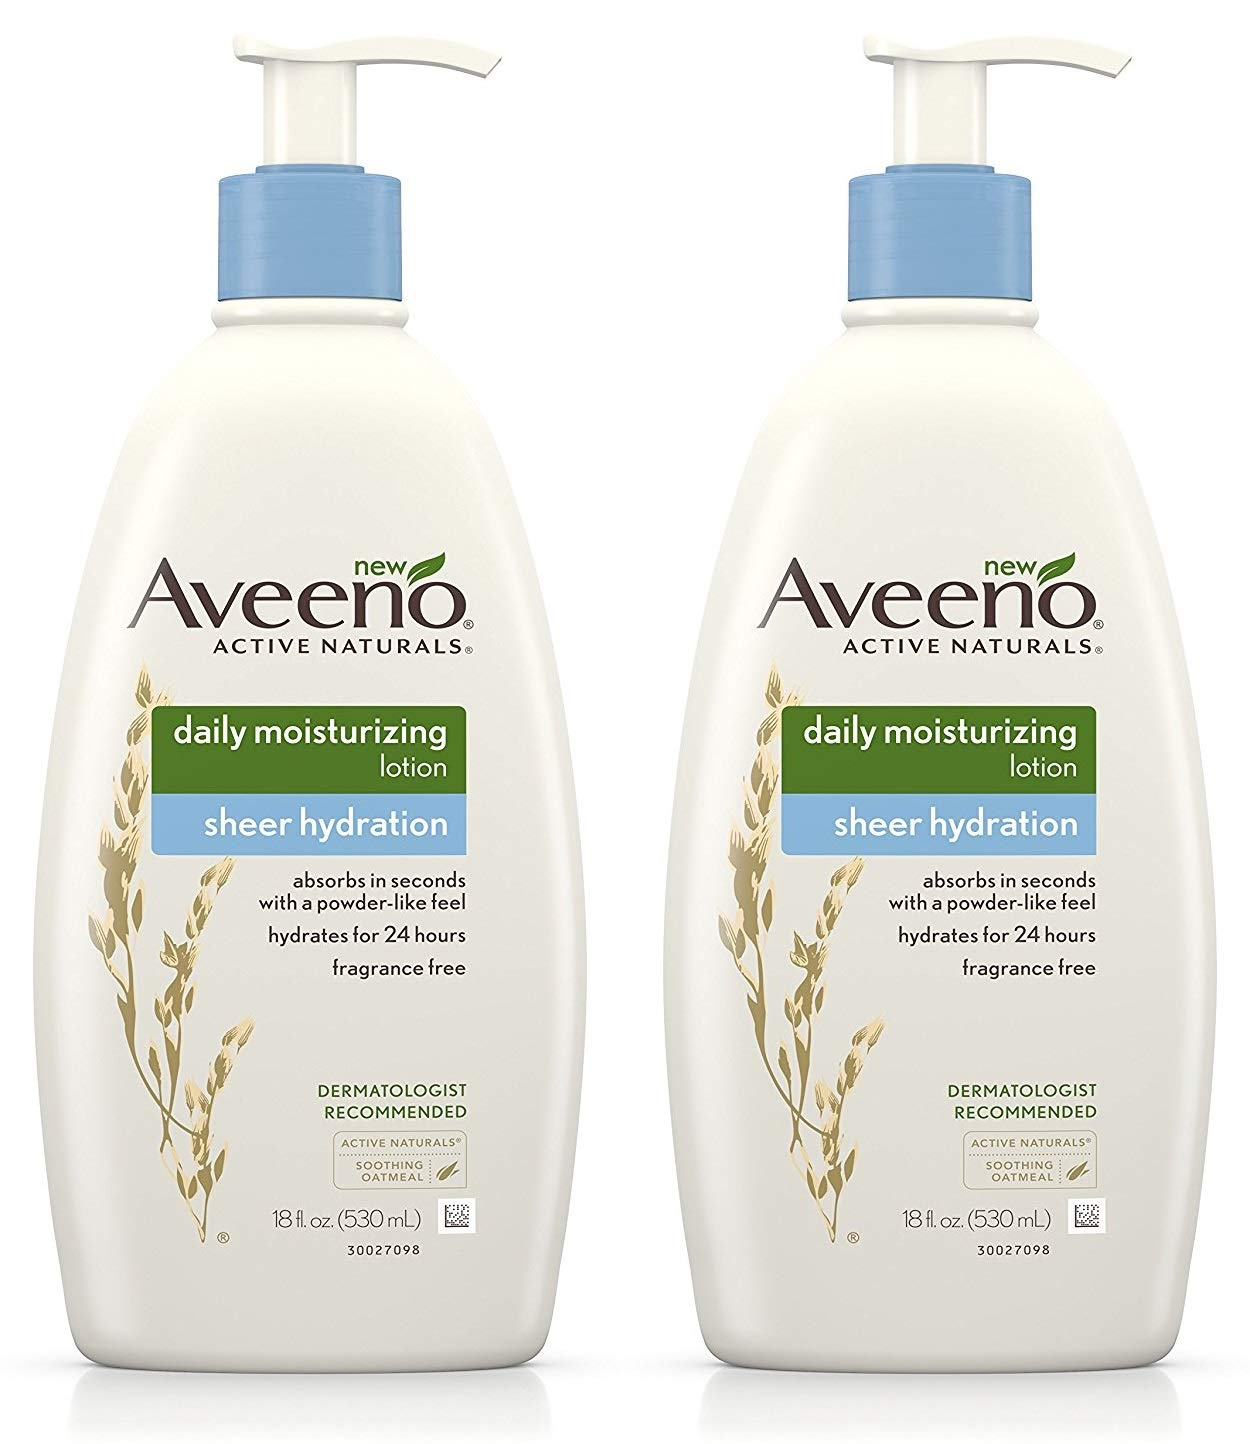 Aveeno Active Naturals - Daily Moisturizing Lotion - Sheer Hydration - Fragrance Free - Net Wt. 18 FL OZ (530 mL) Per Bottle - Pack of 2 Bottles